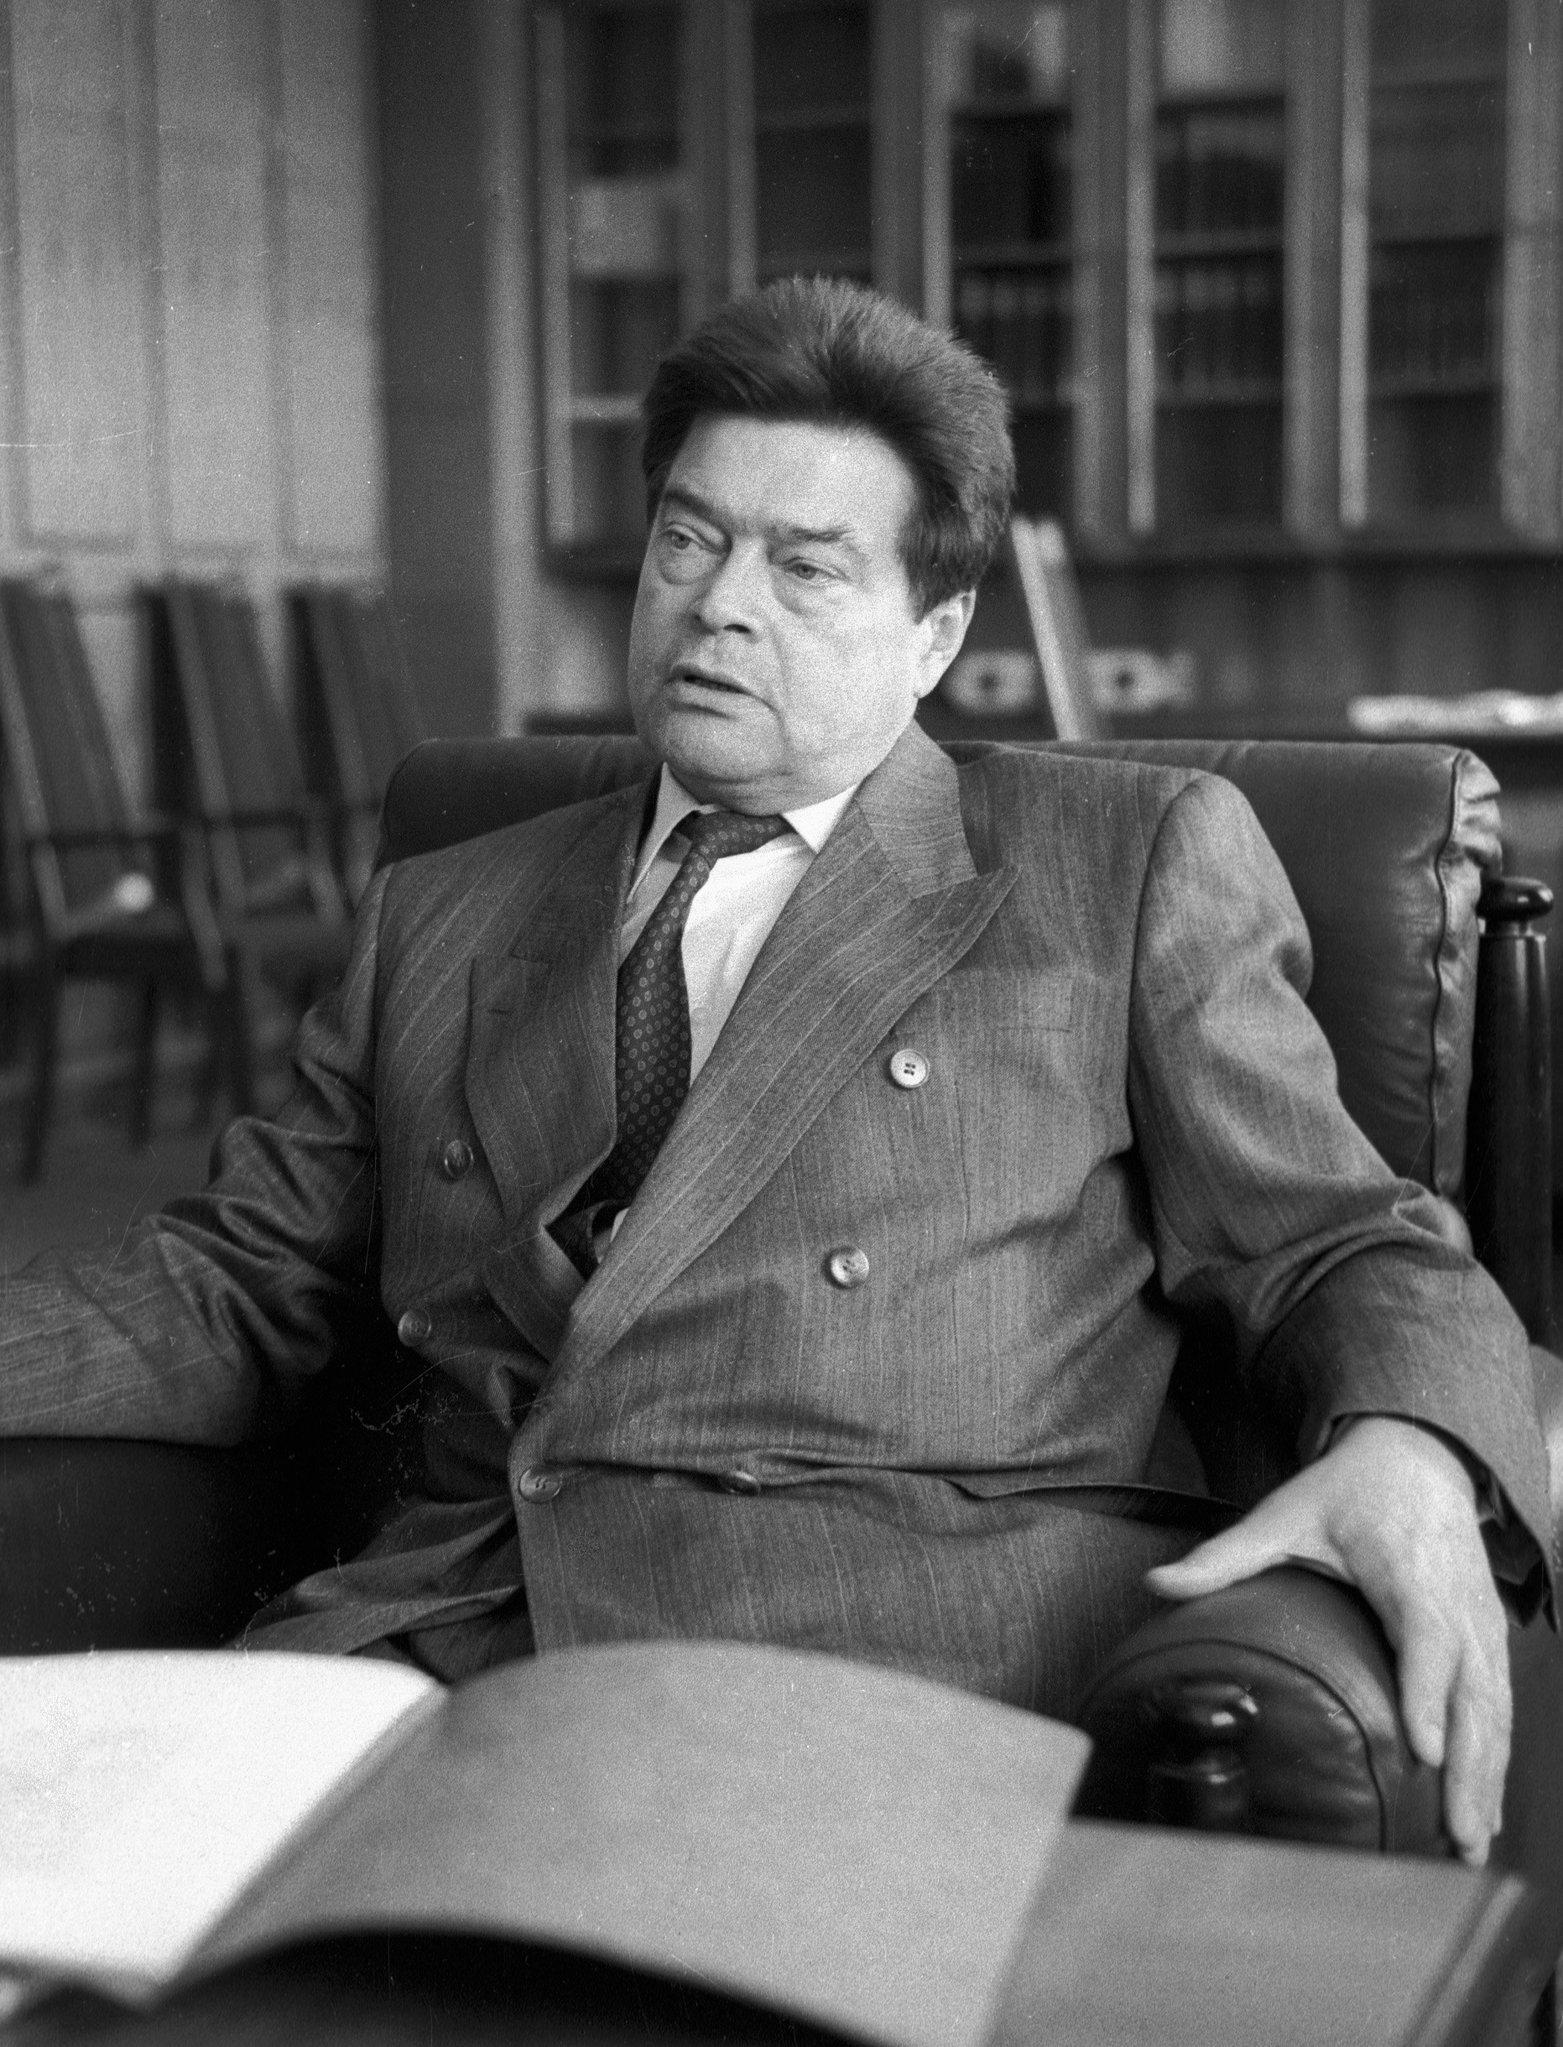 Boris Pankin (1931 - ), ministro degli affari esteri dell'URSS ad interim